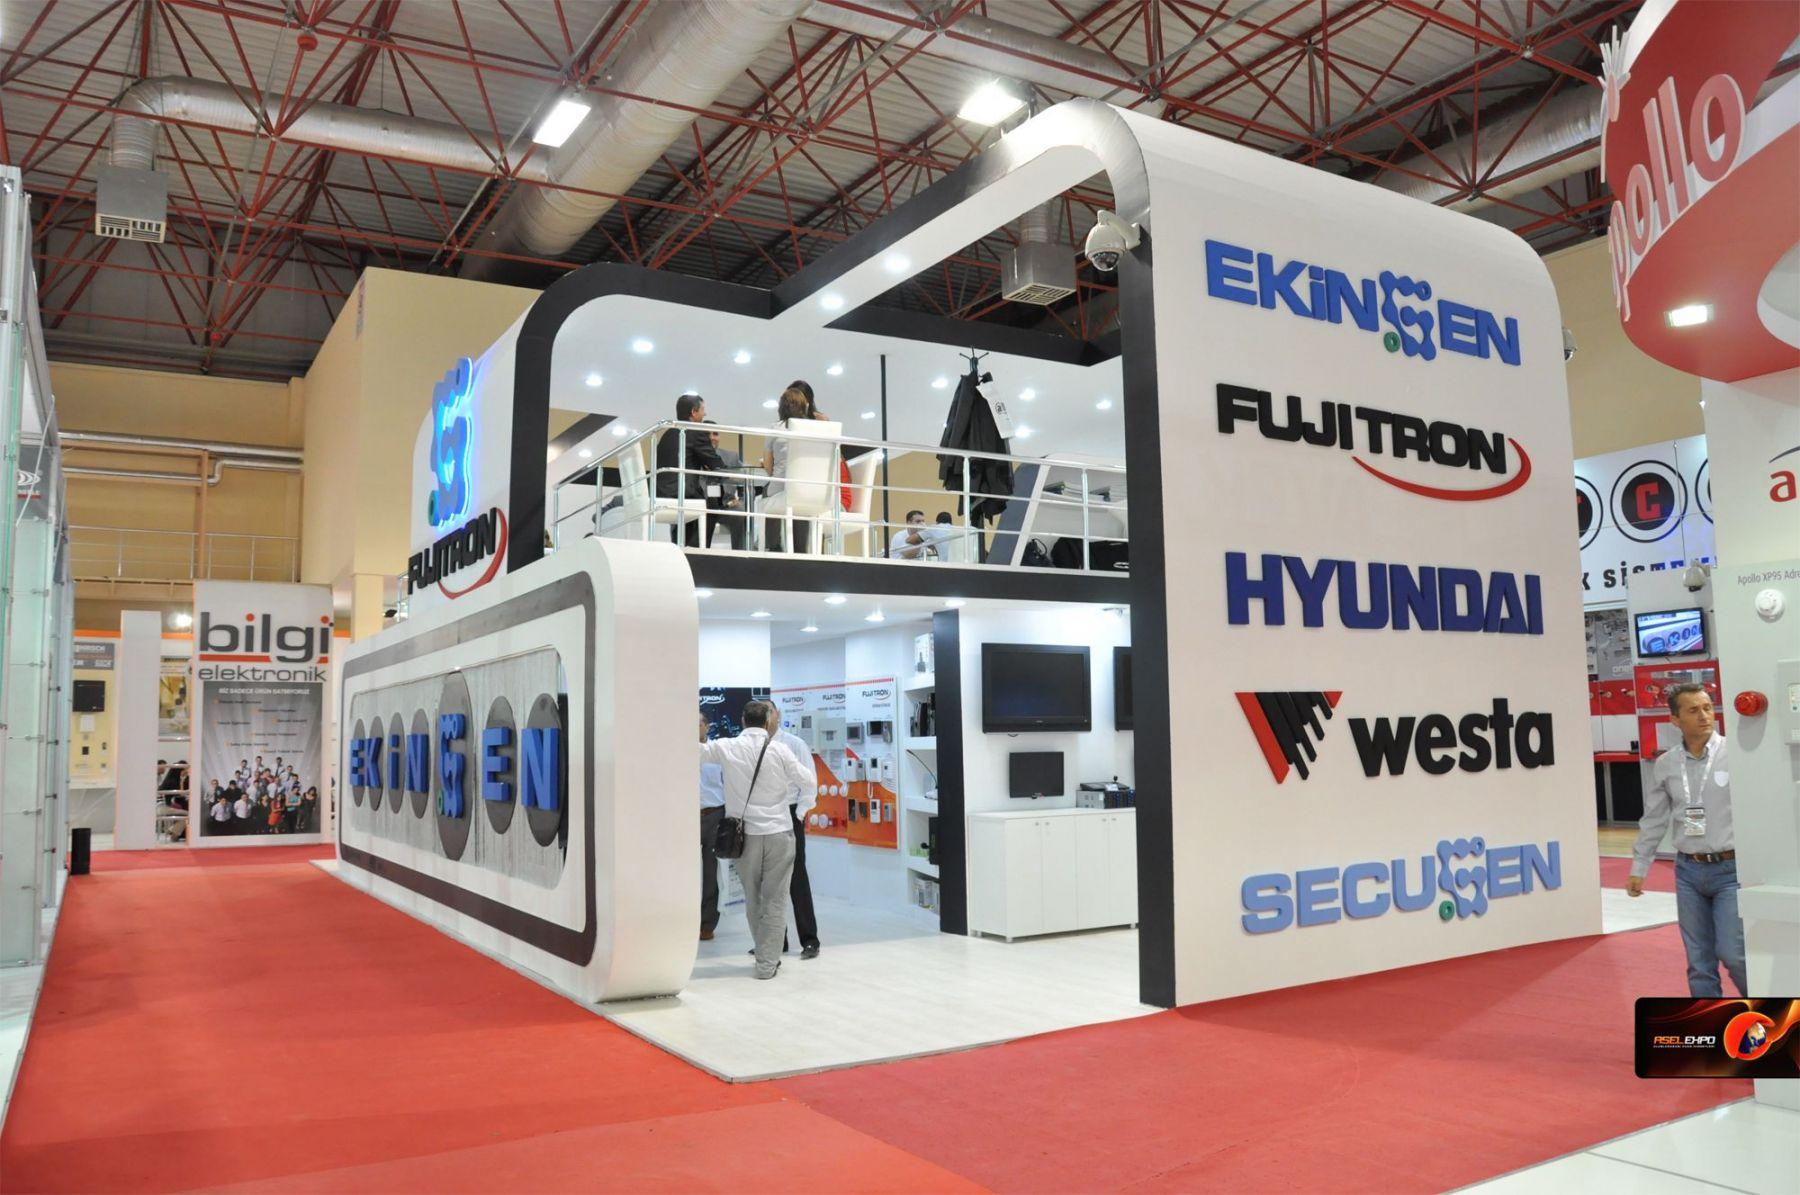 Expo Stand Elenco : Foto di stand asel expo istanbul